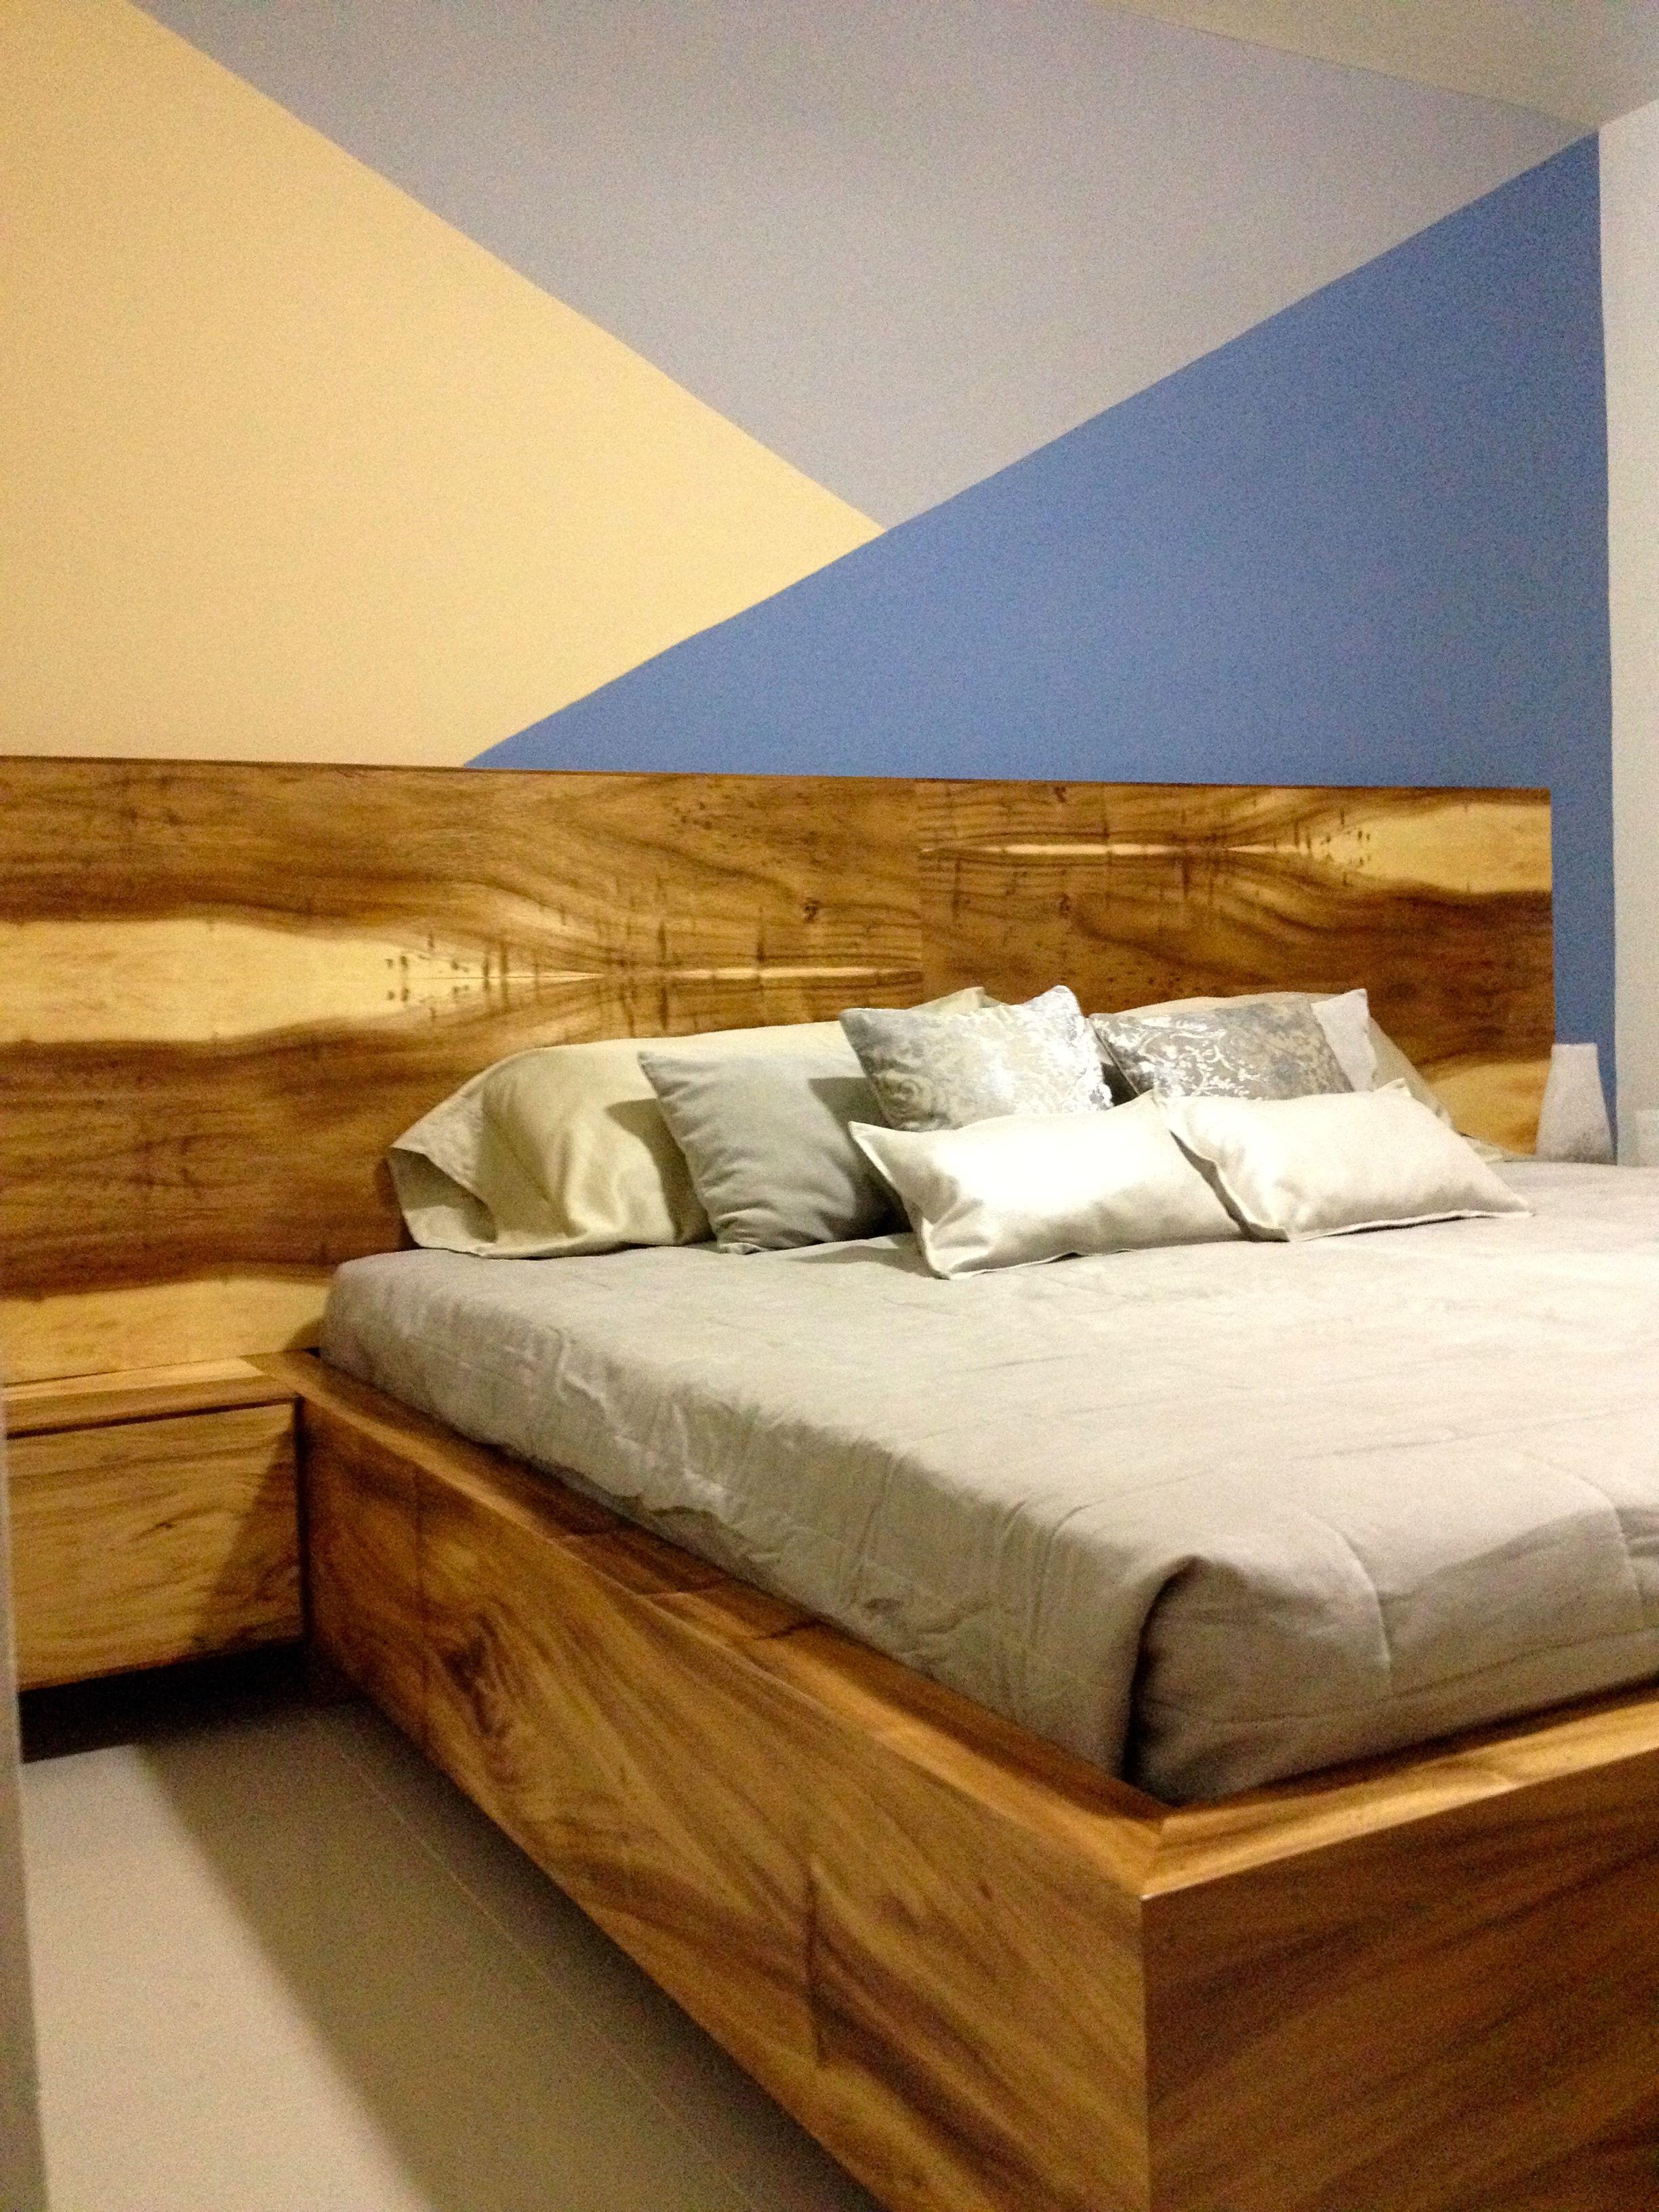 recamara principal hecha de madera de parota. la pintura del muro ...